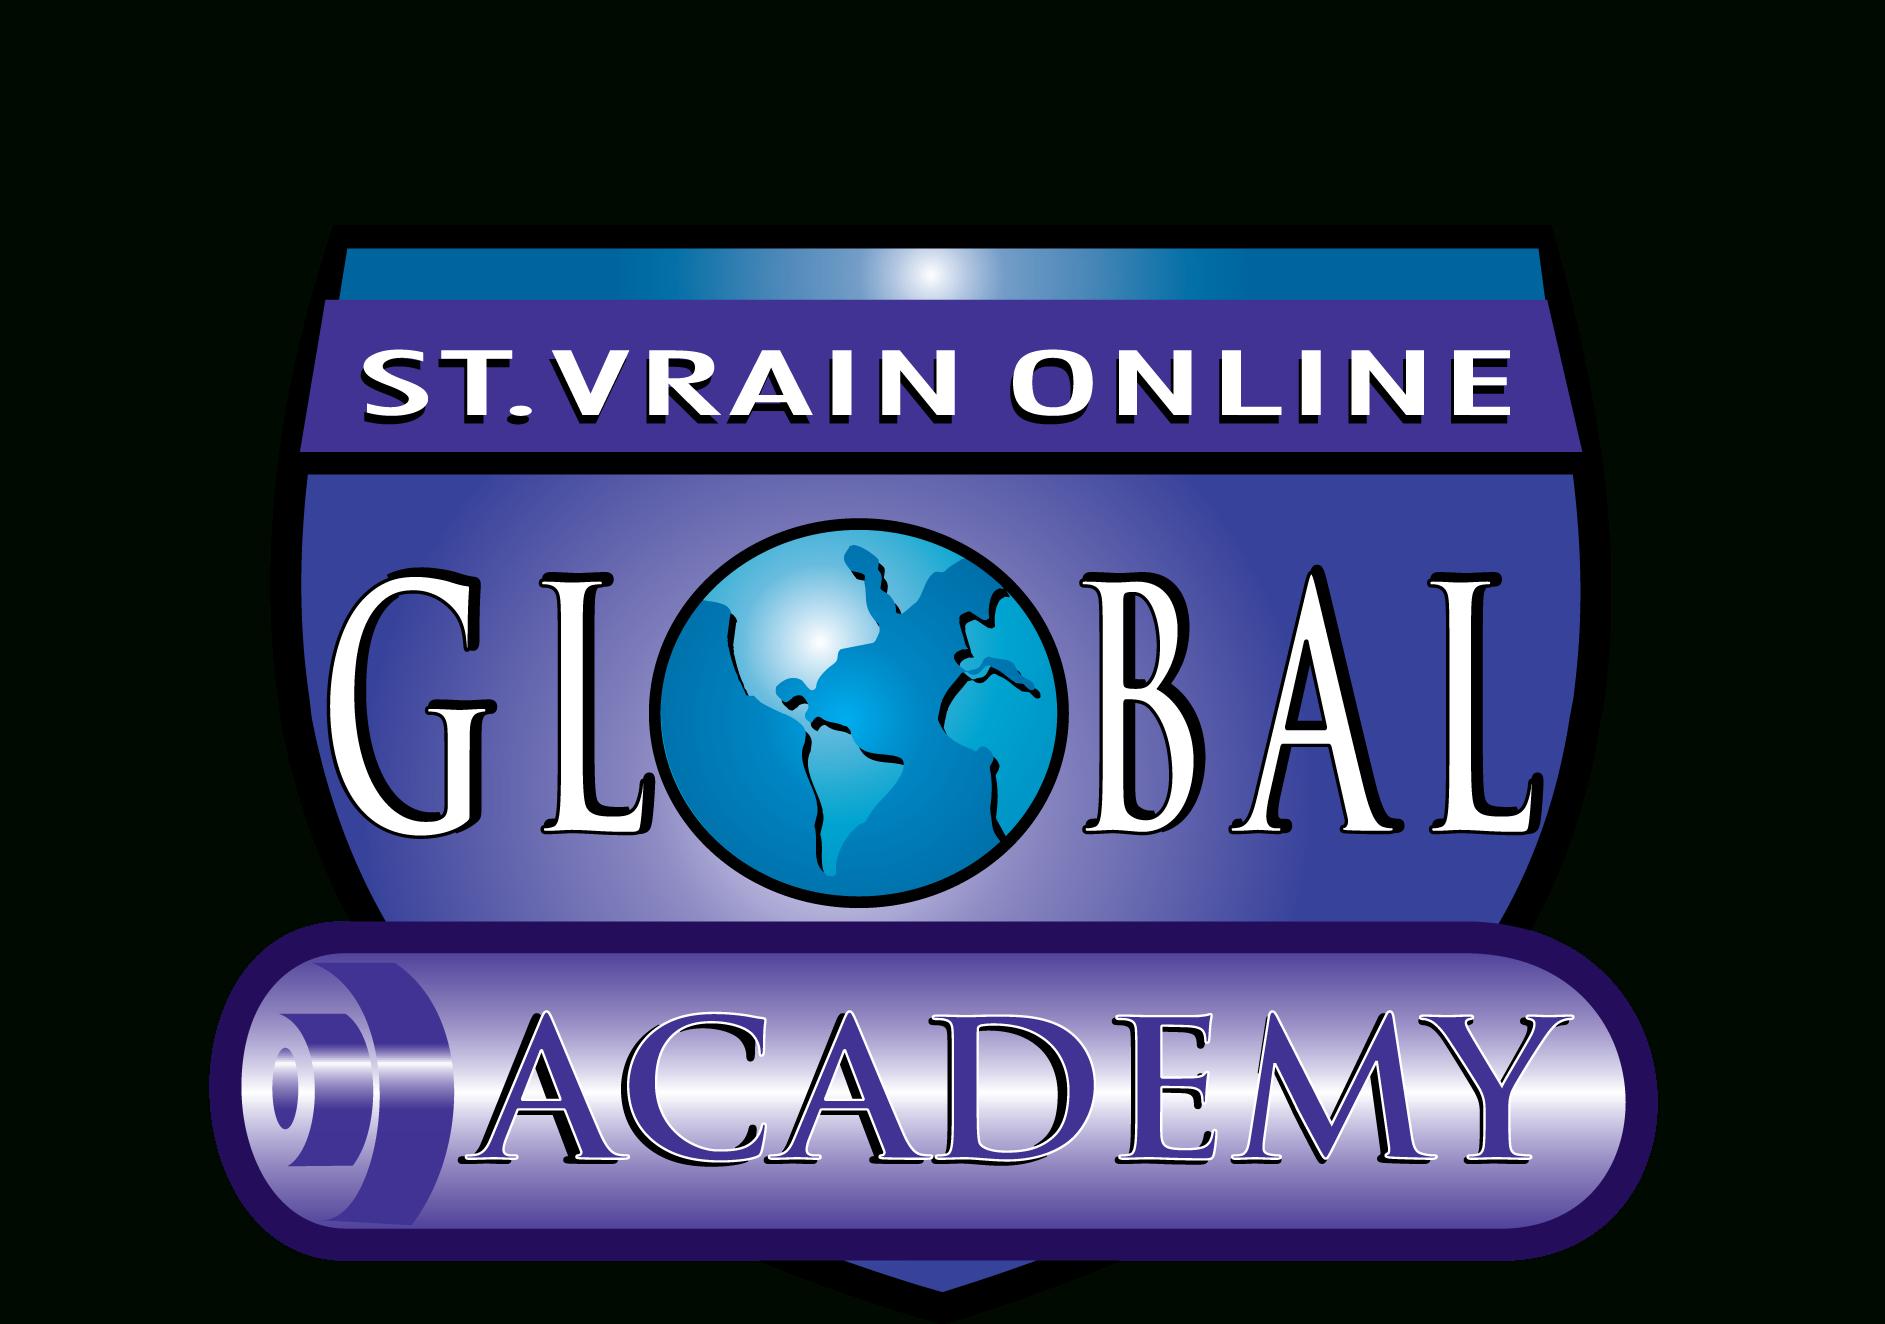 St. Vrain Online Global Academy Logos | St Vrain Valley Regarding St Vrain Valley School Dist Calendar